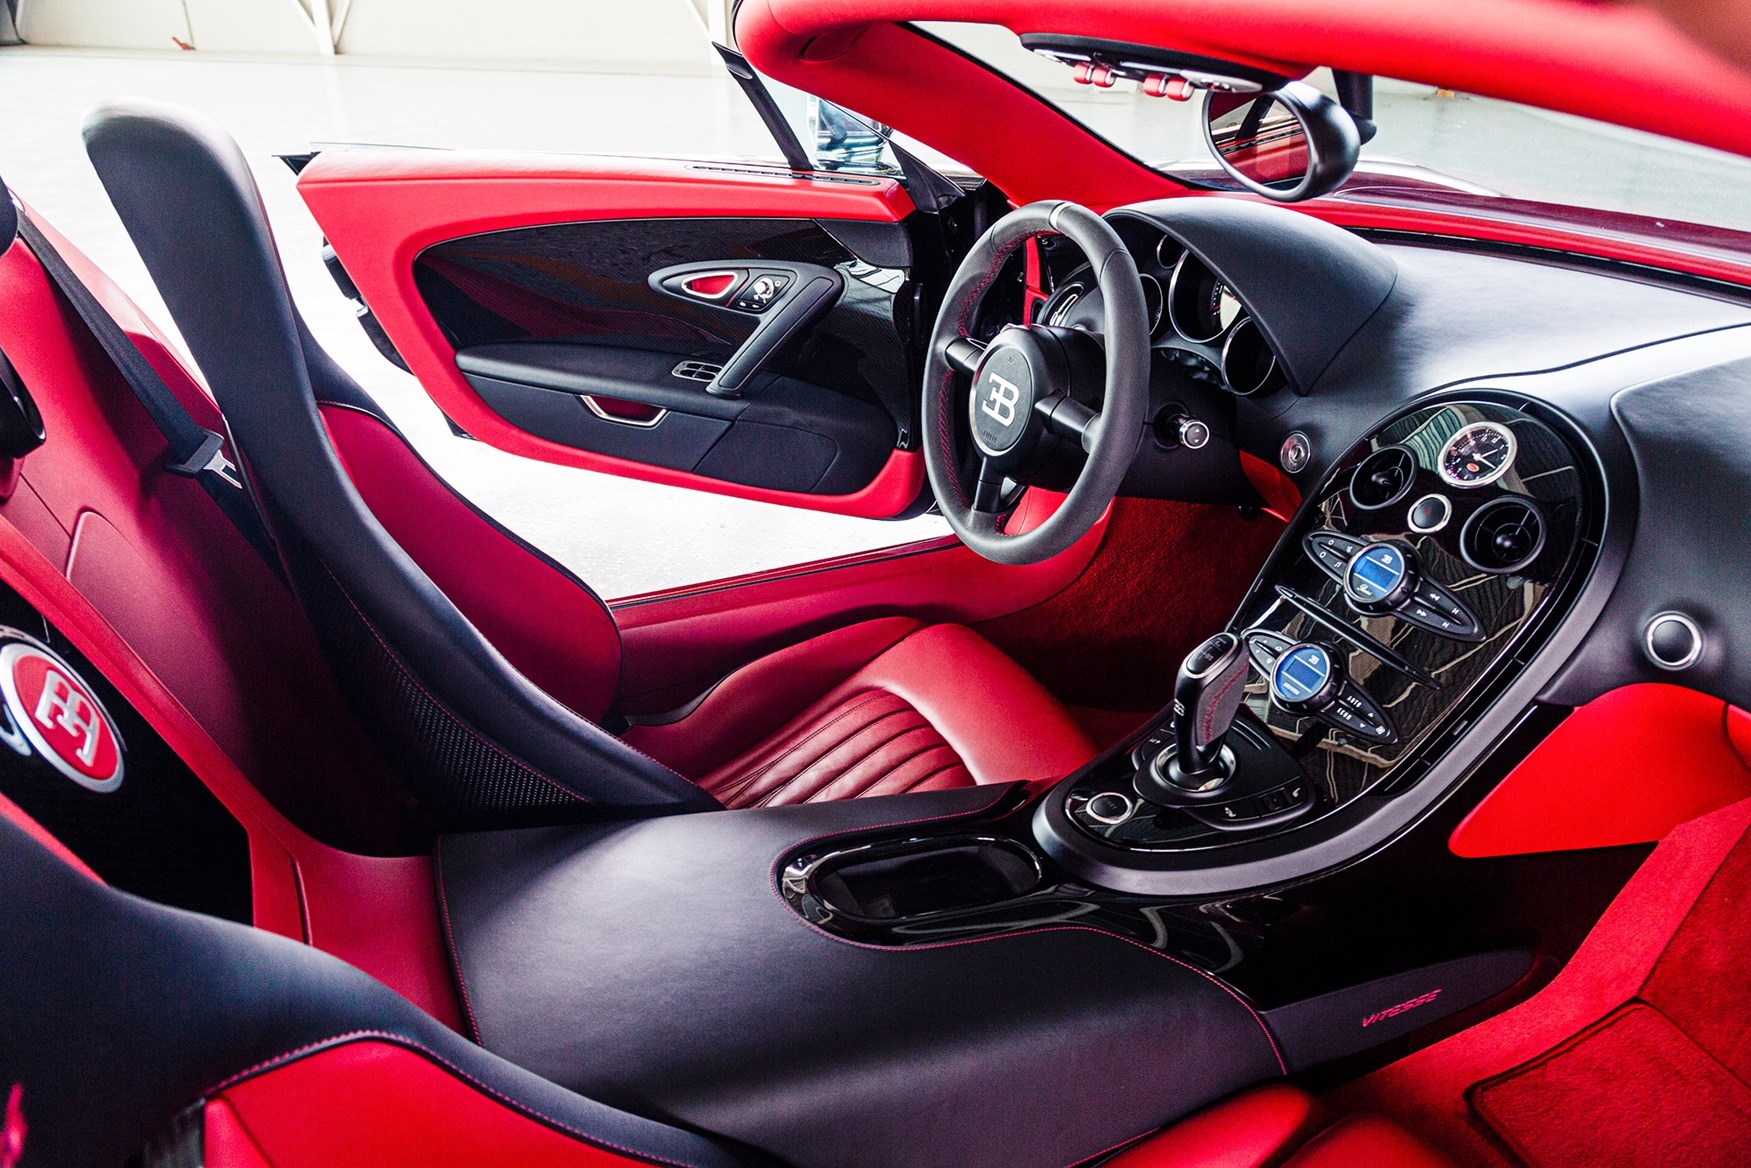 bugattiveyron05 Fascinating Bugatti Veyron Grand Sport Vitesse 1/4 Mile Cars Trend